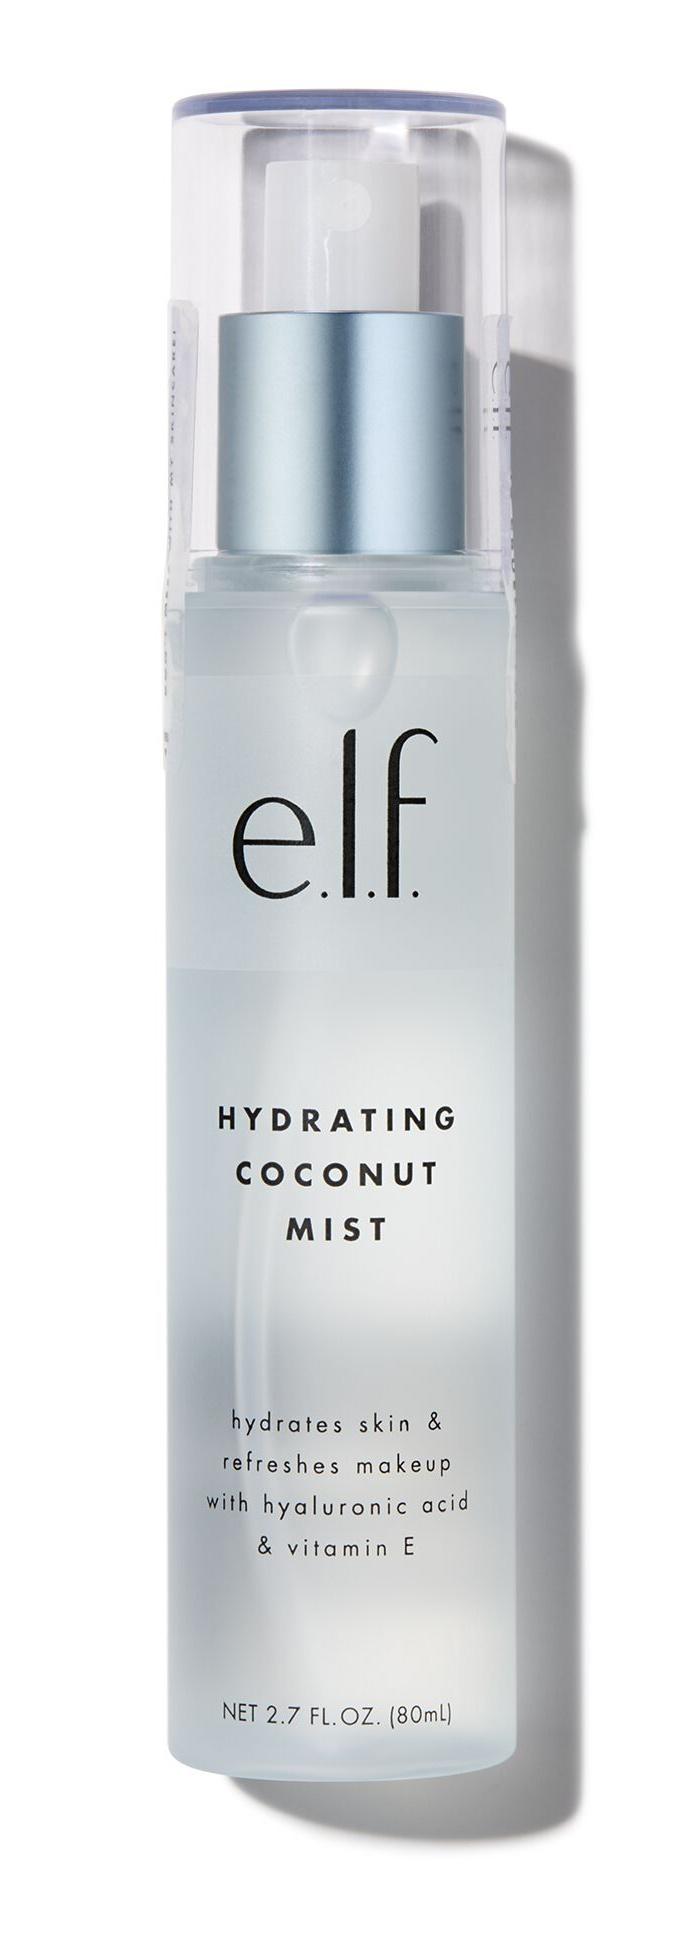 e.l.f. Hydrating Coconut Mist